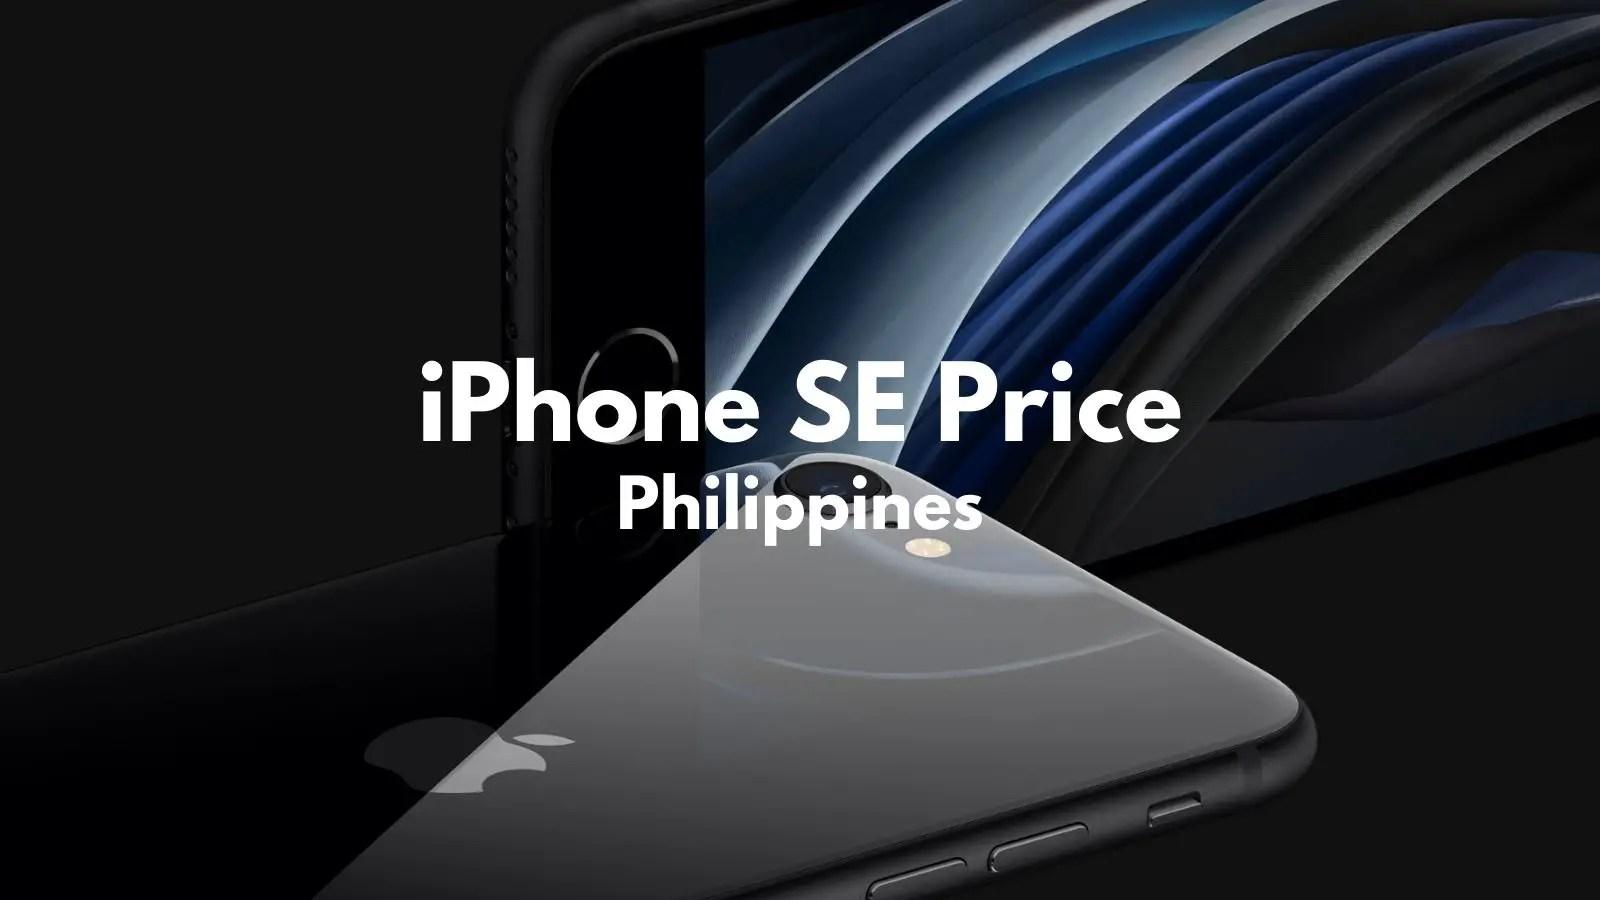 iphone se 2020 price philippines